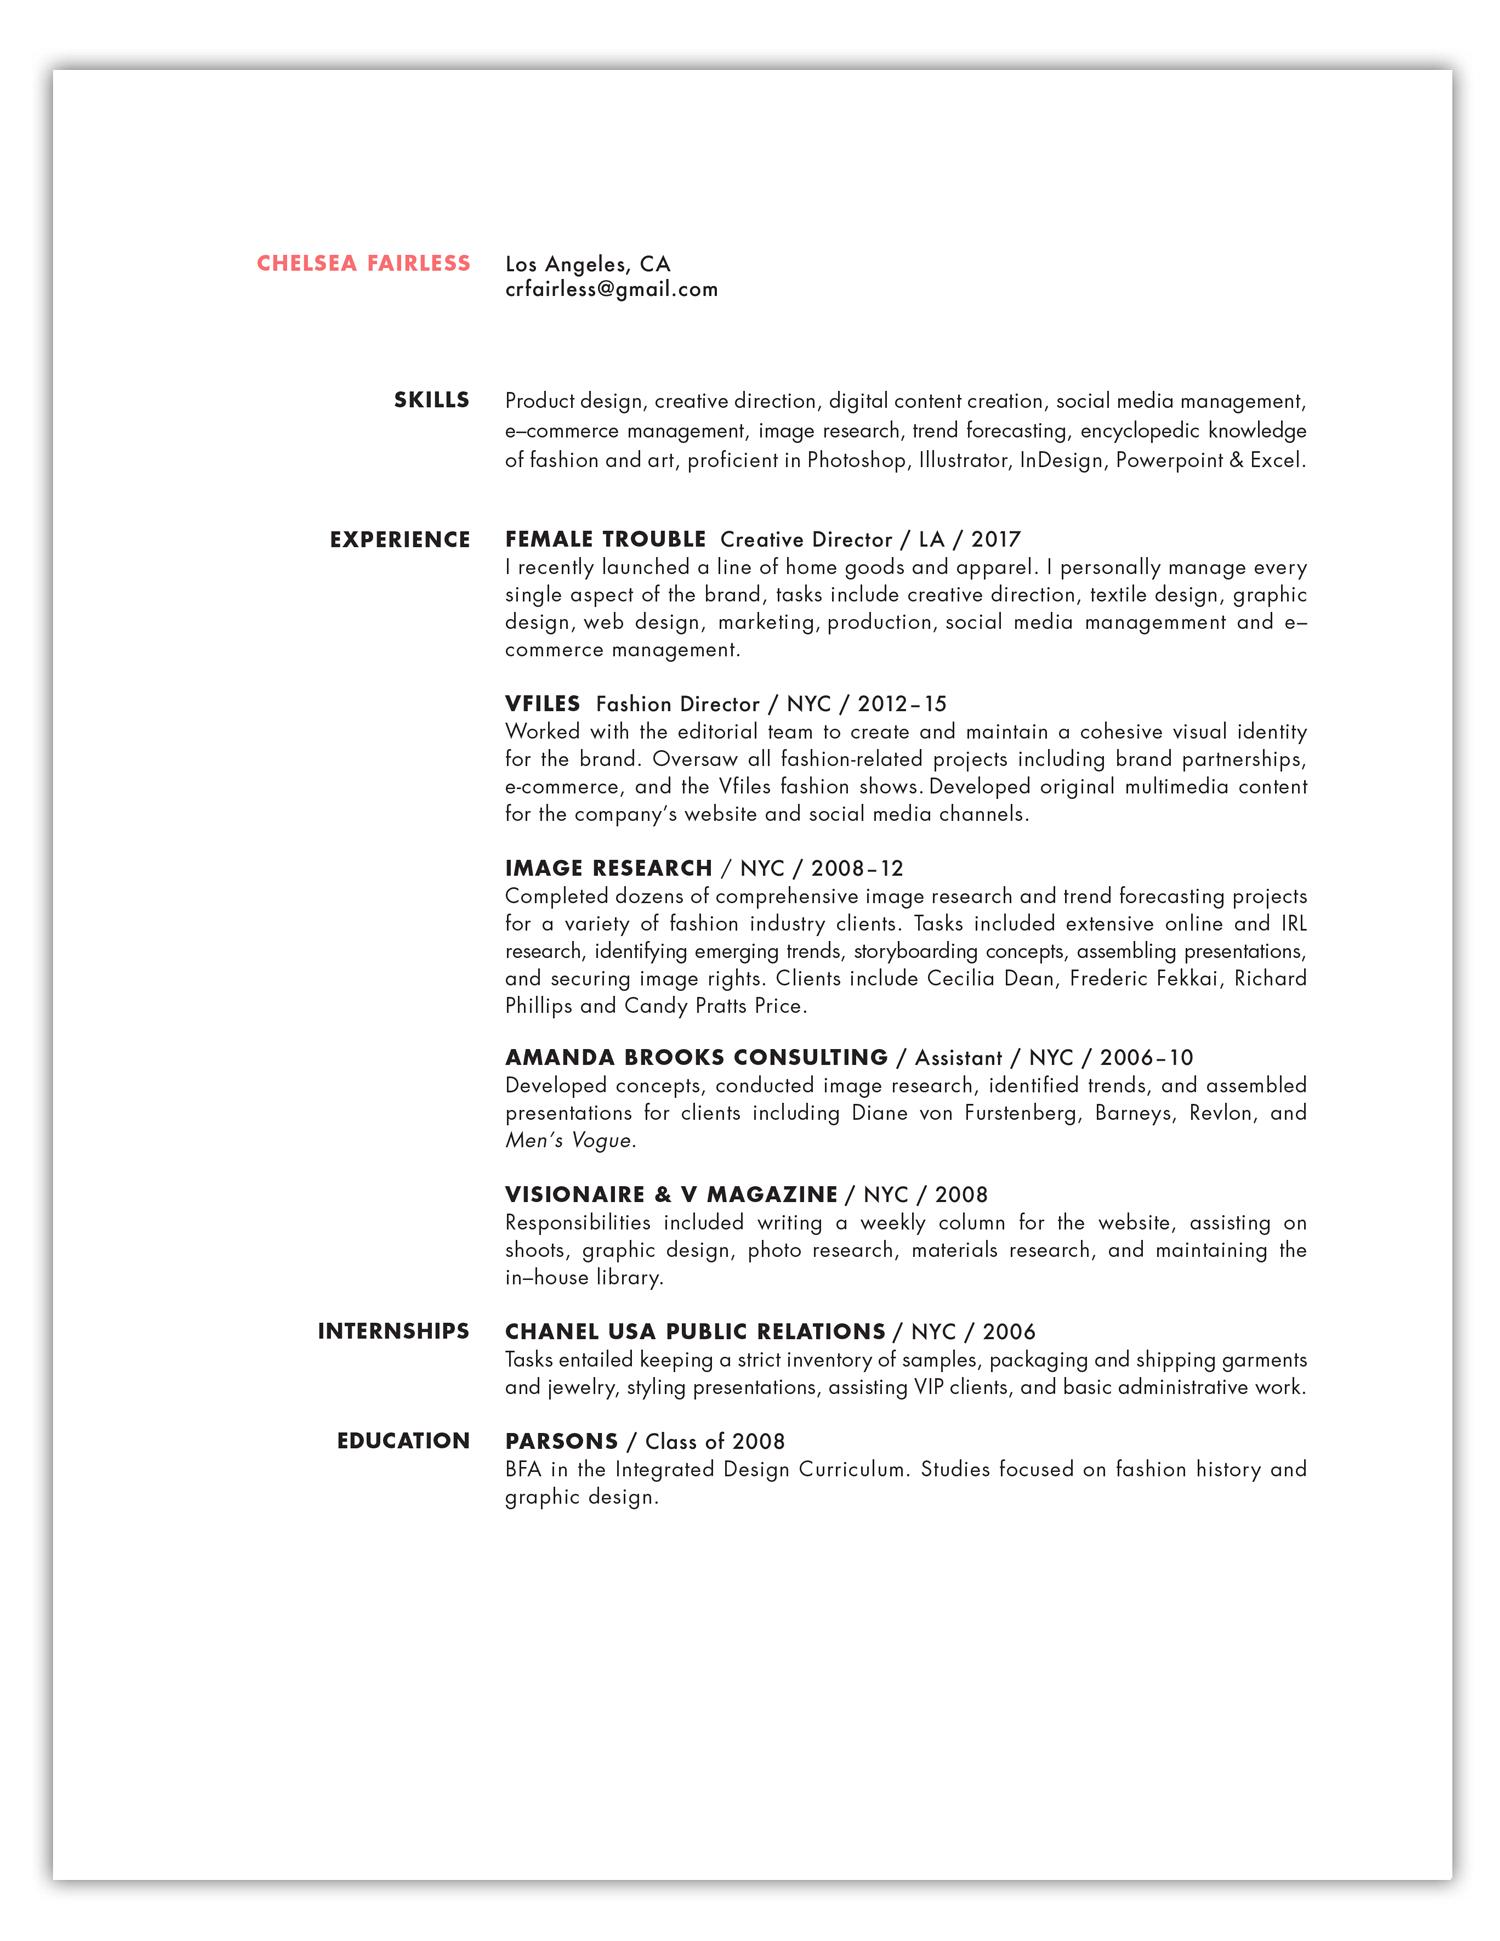 resume_dropshadow_3.jpg